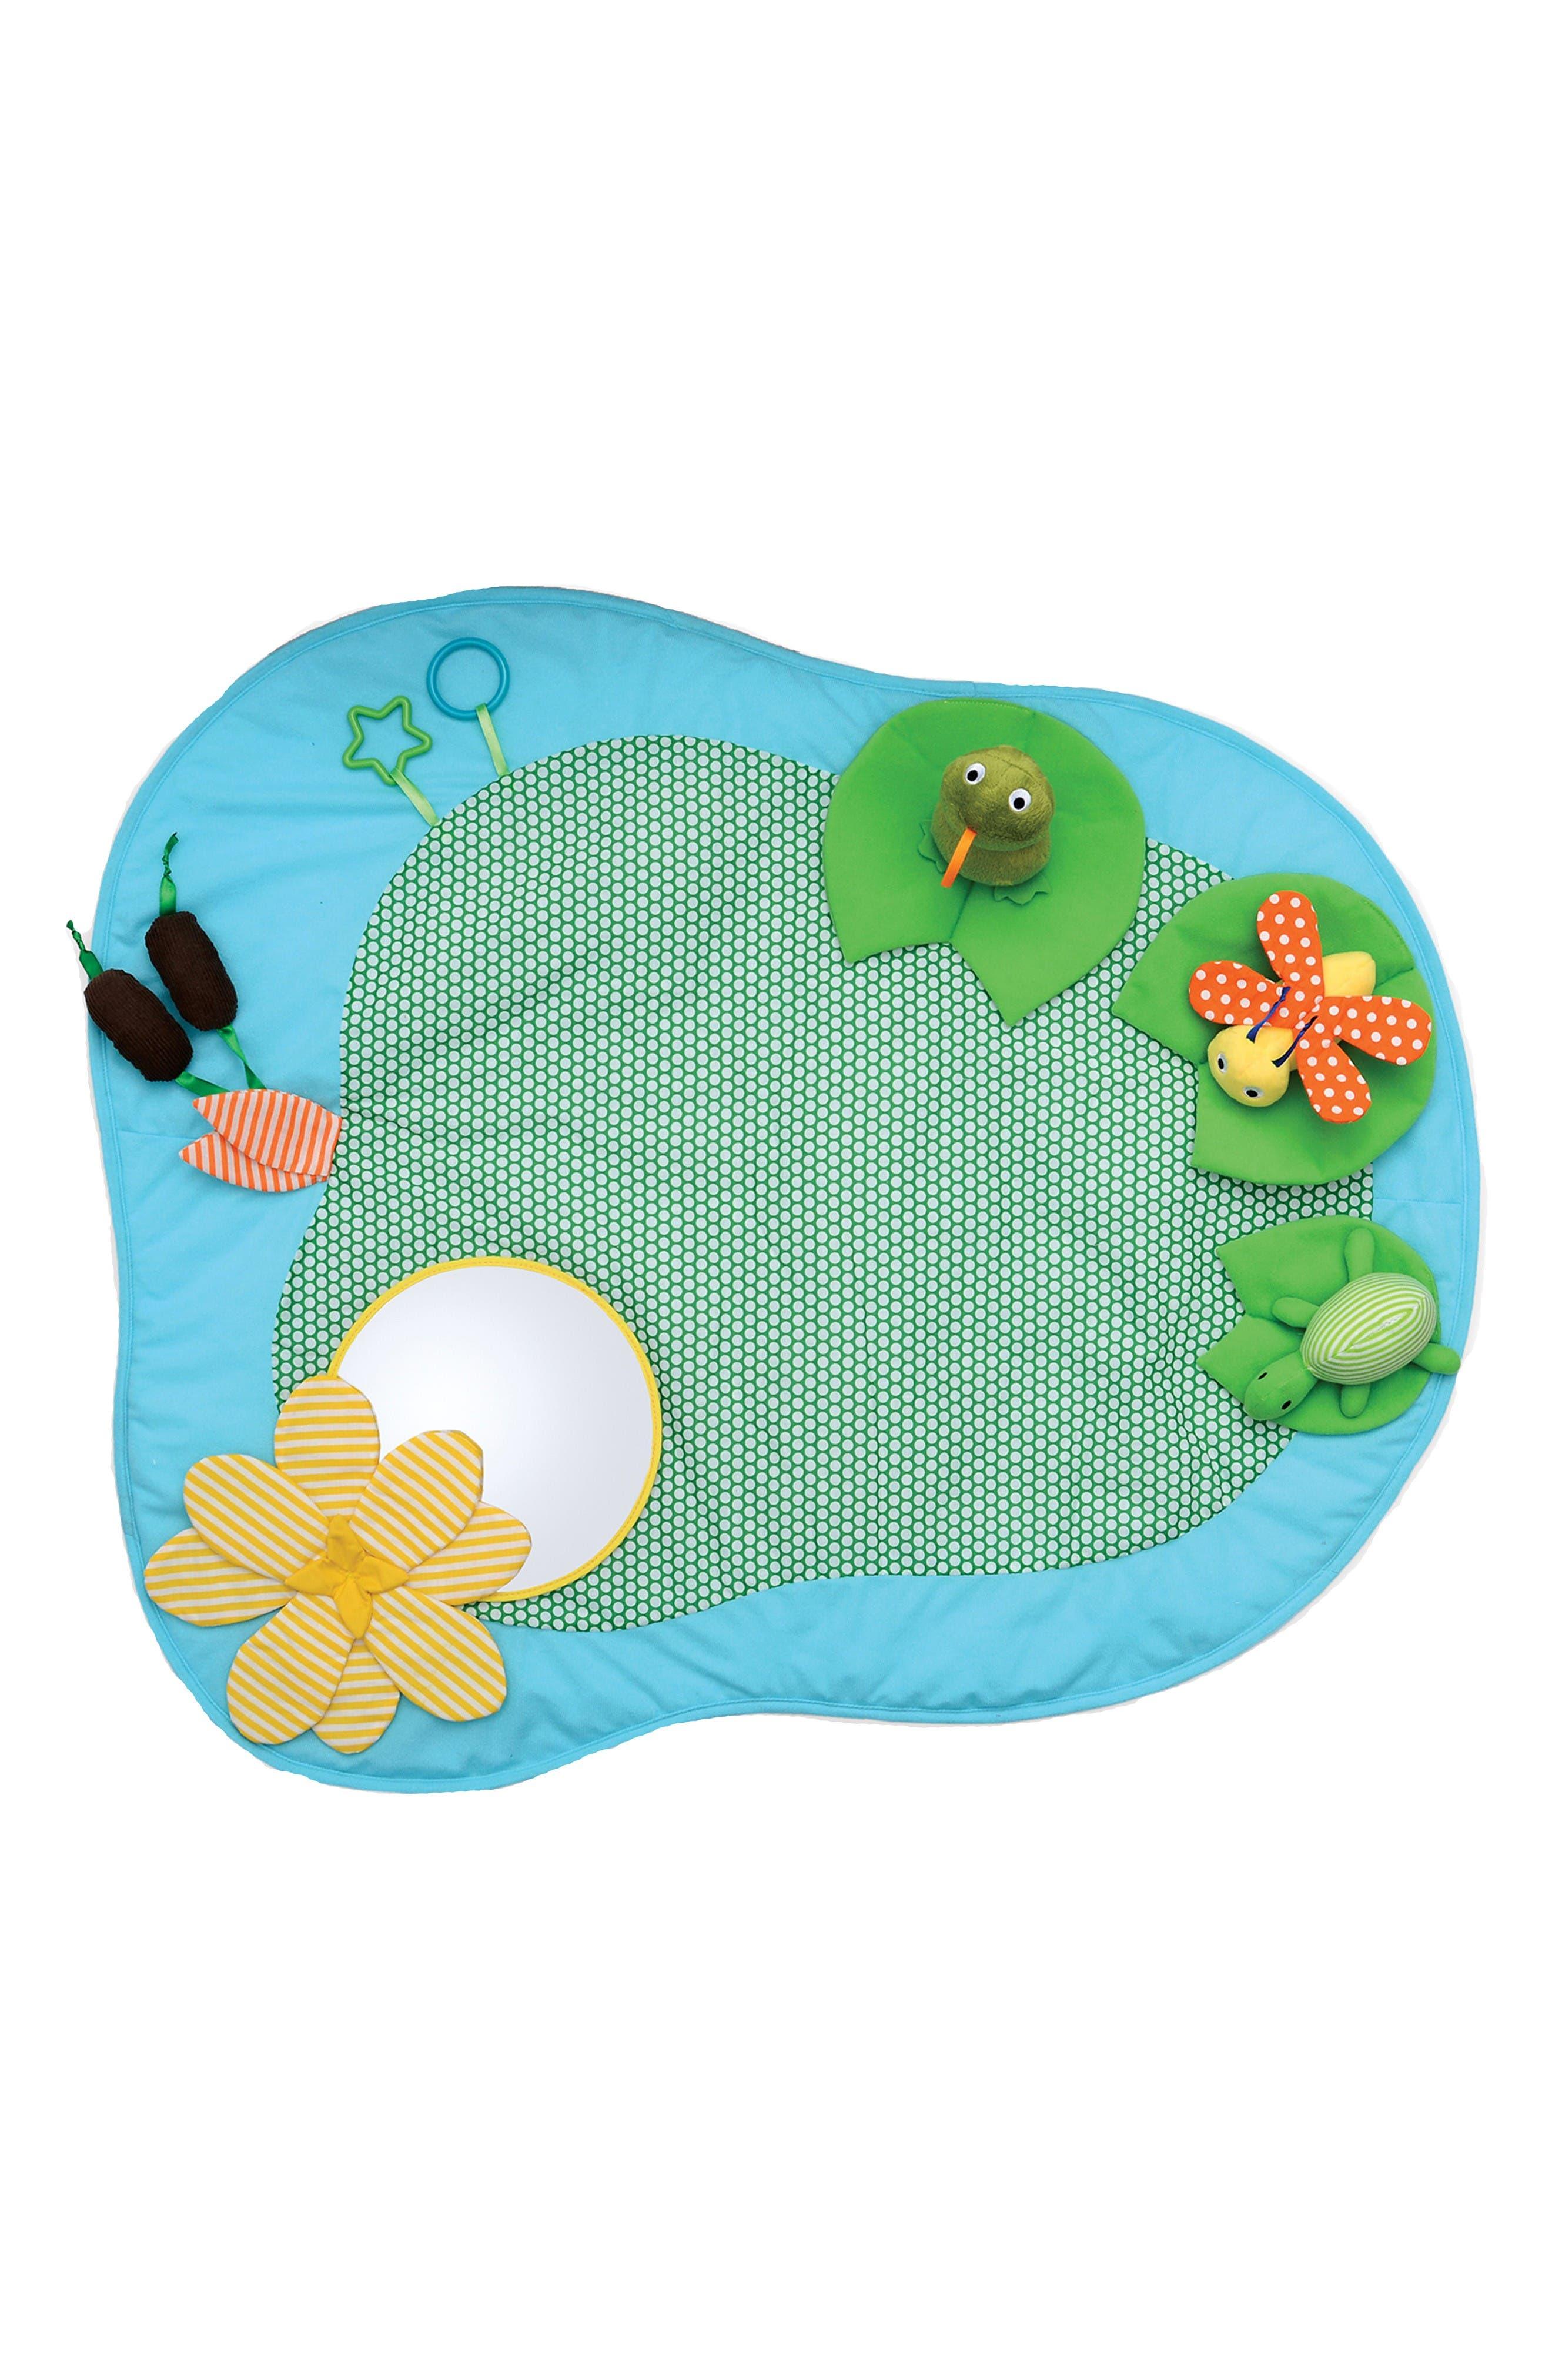 Playtime Pond Mat,                         Main,                         color, Blue